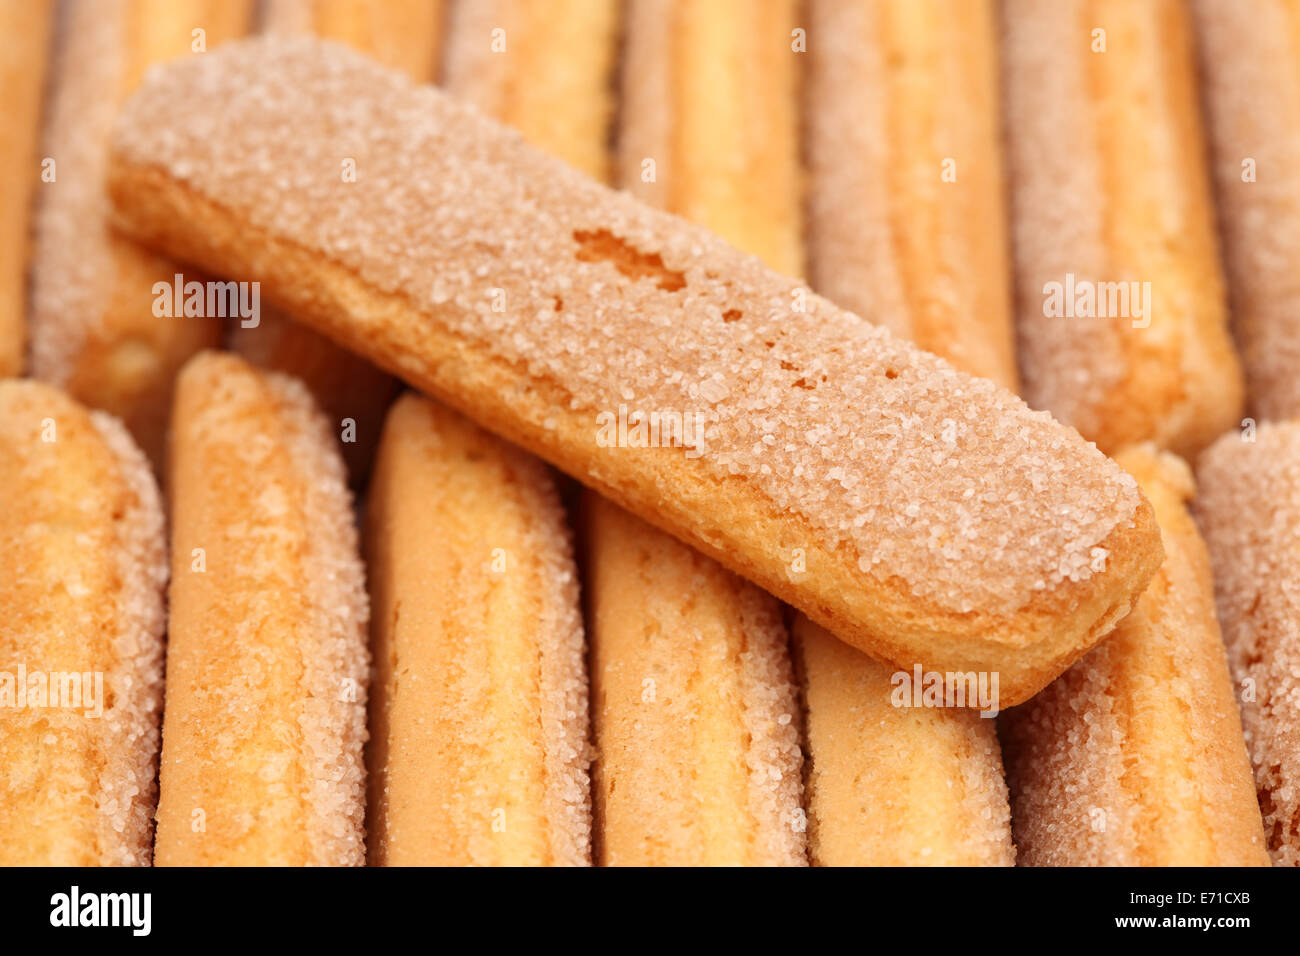 Biscuits closeup. - Stock Image